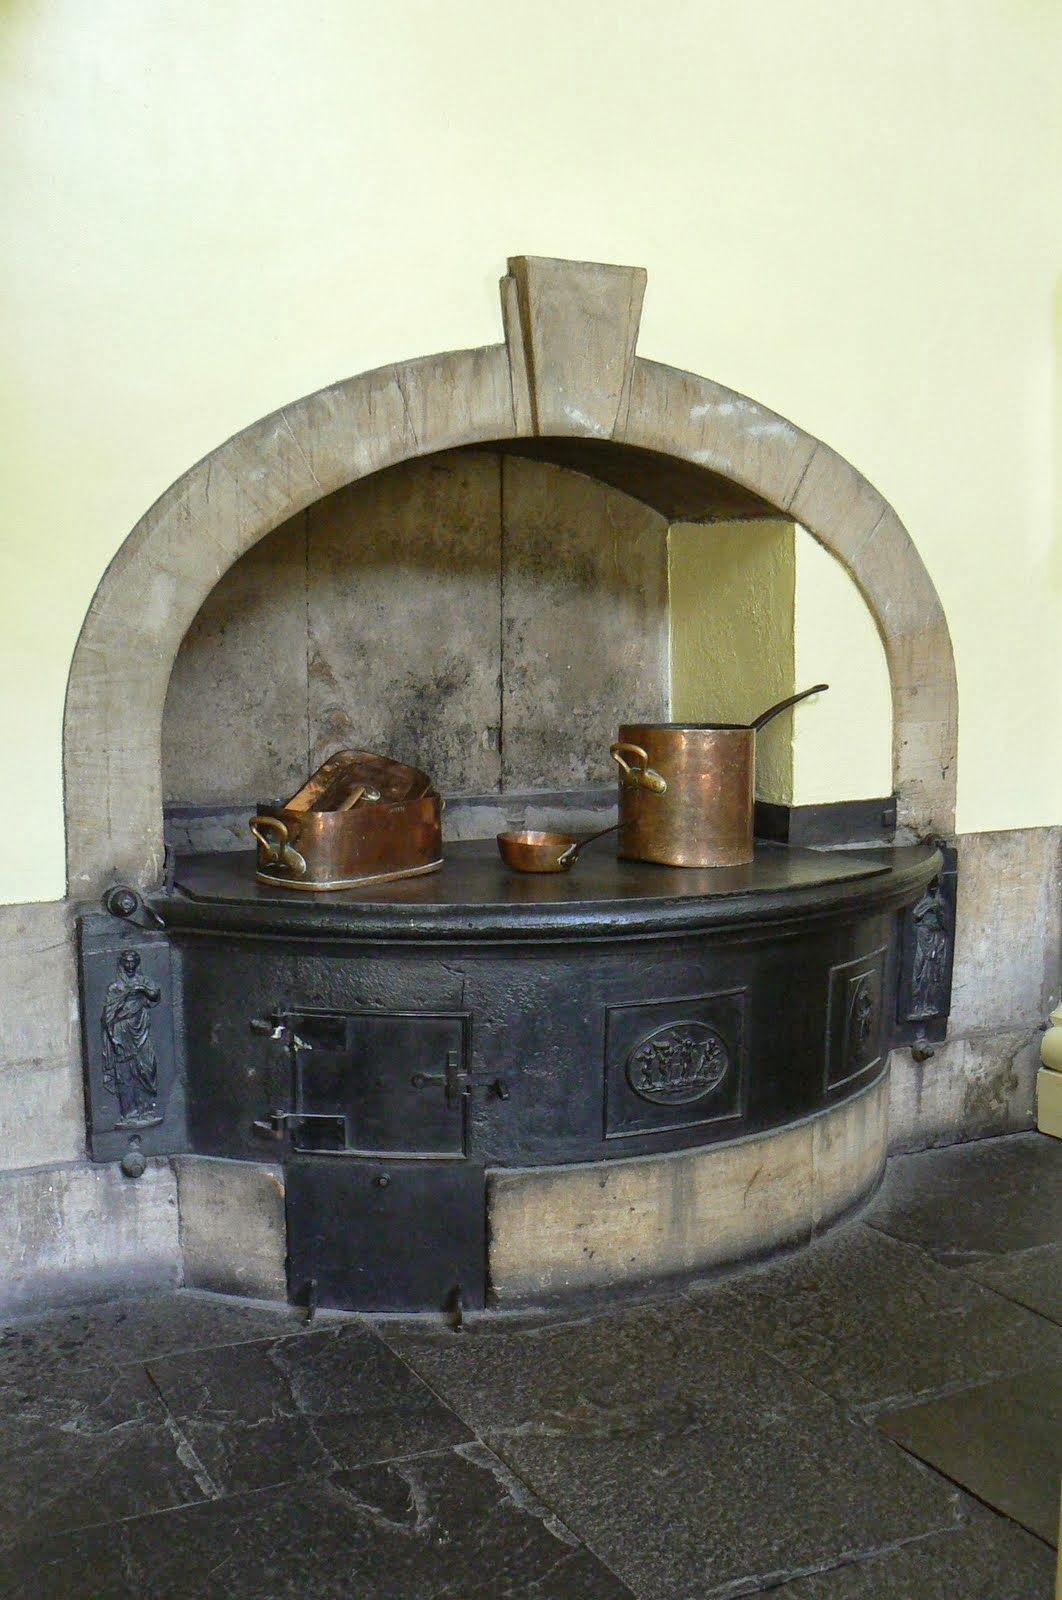 kitchens callendar house scotland vintage stoves wood burning stove antique stove on outdoor kitchen vintage id=45474